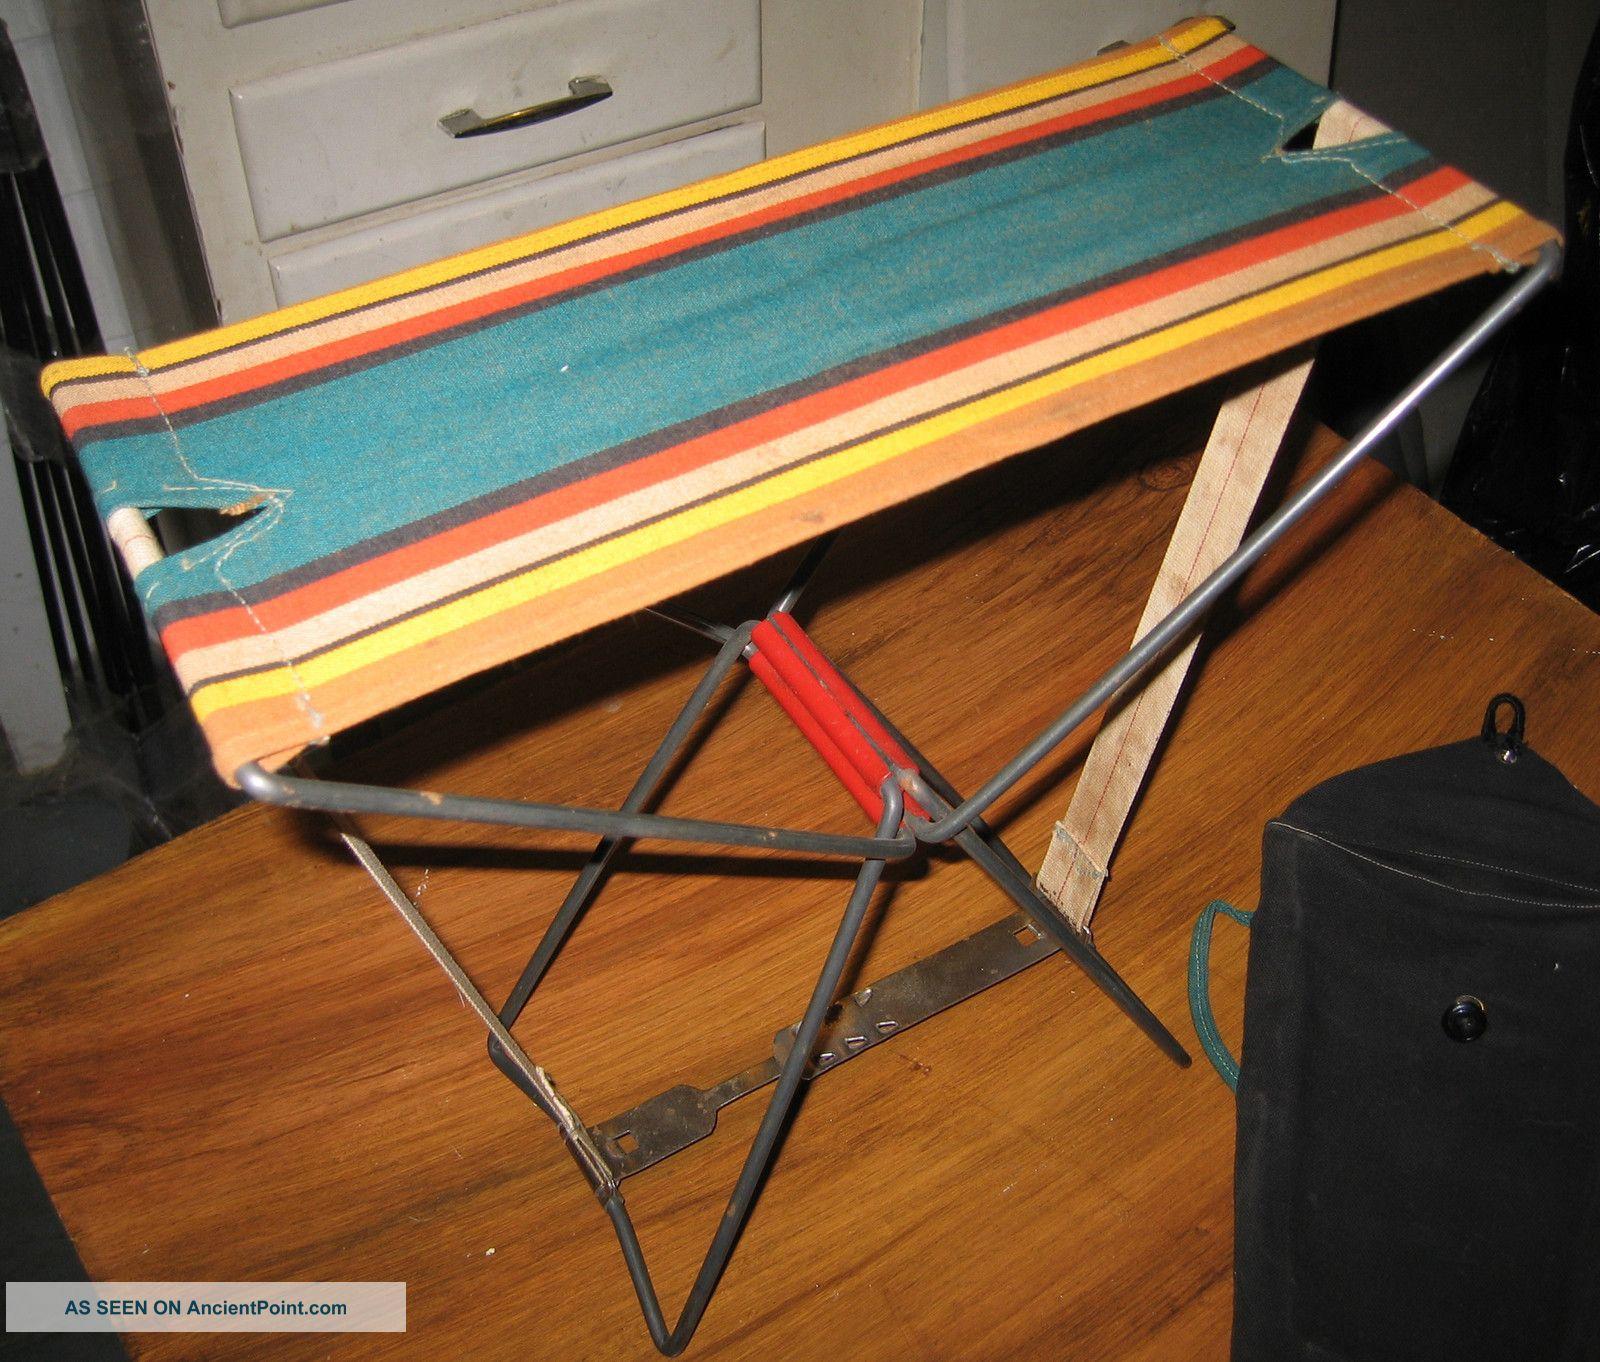 Vintage Portable Folding Camp Seat Unknown photo